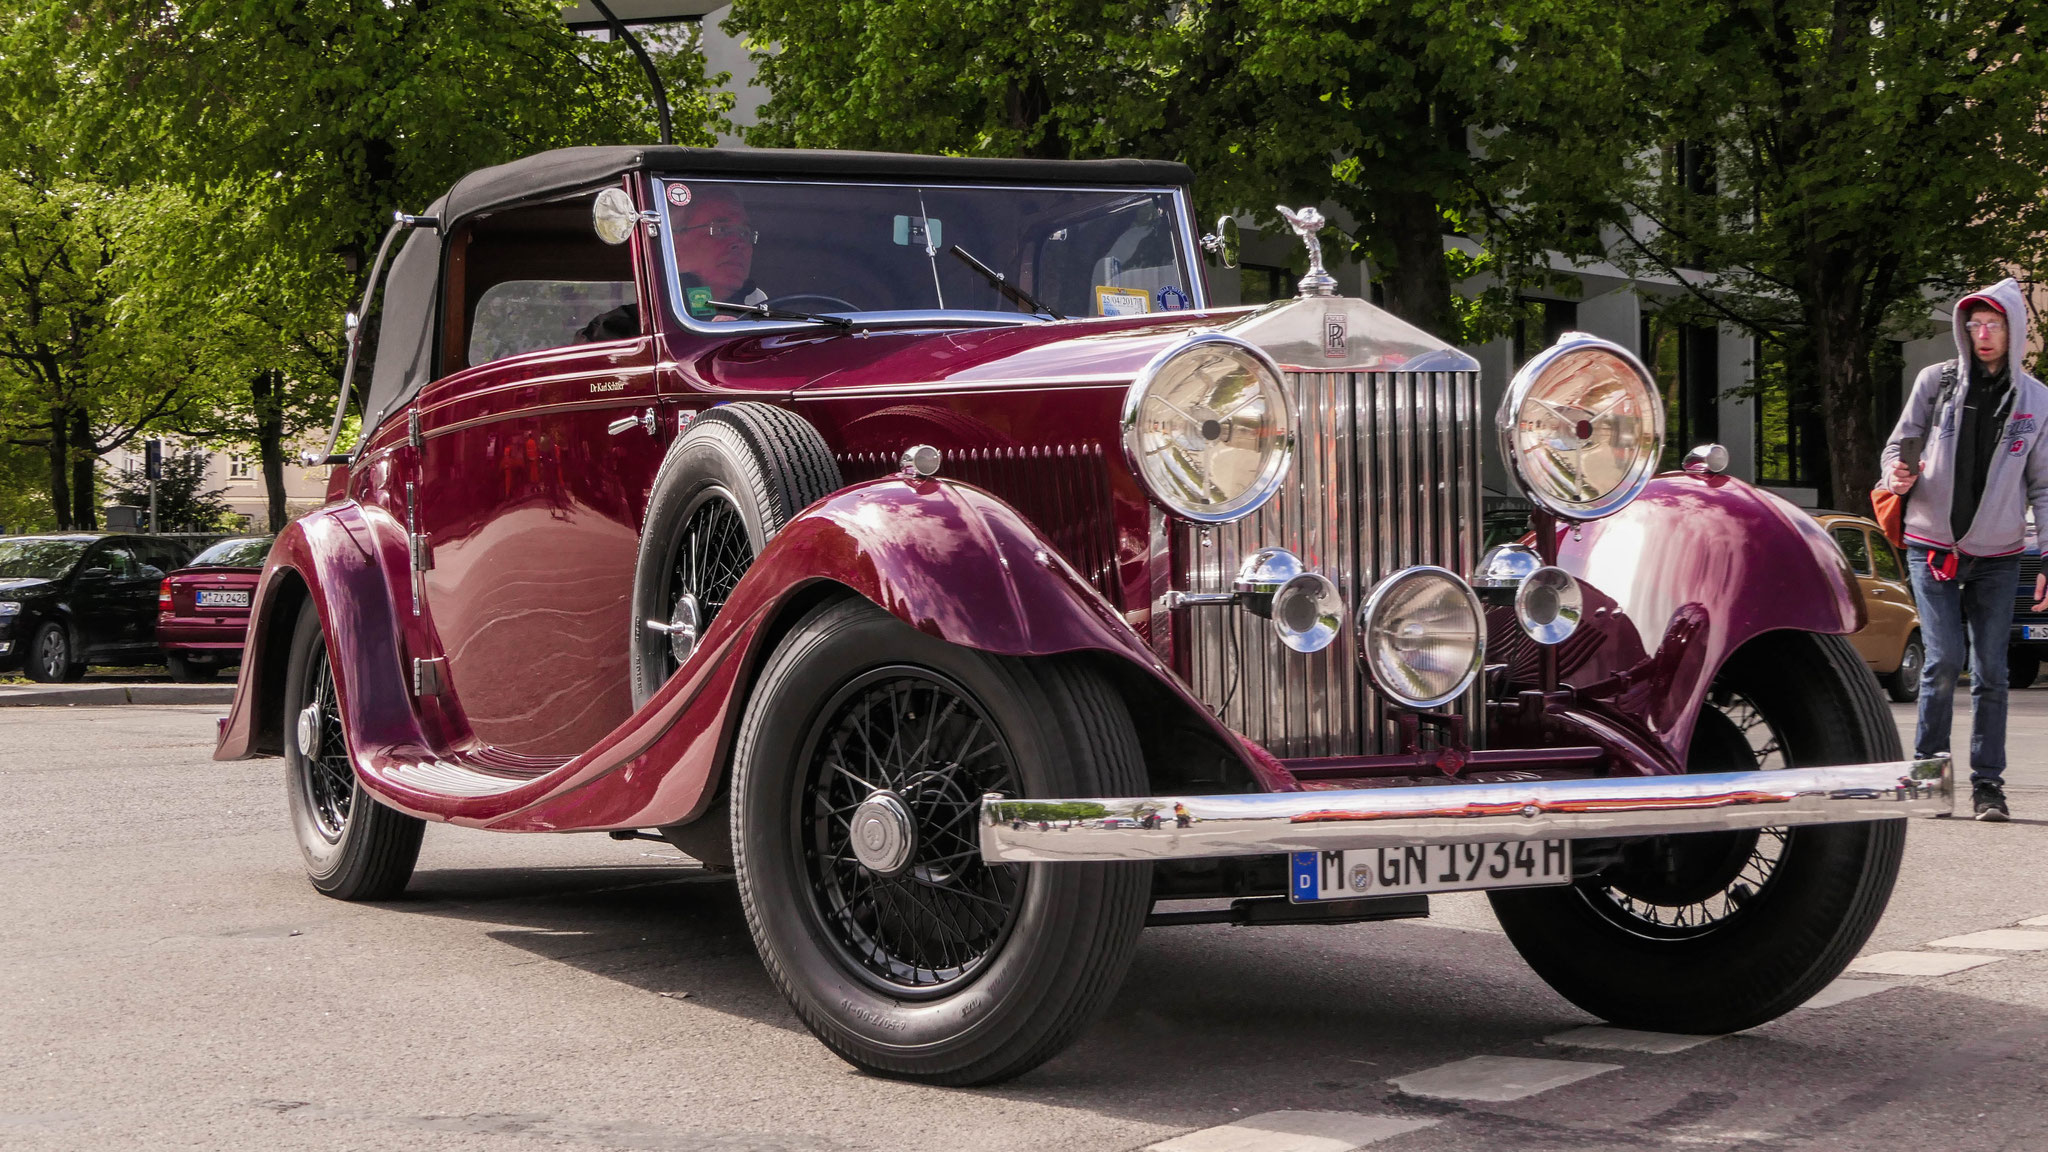 Rolls Royce Phantom II - M-GN-1934H